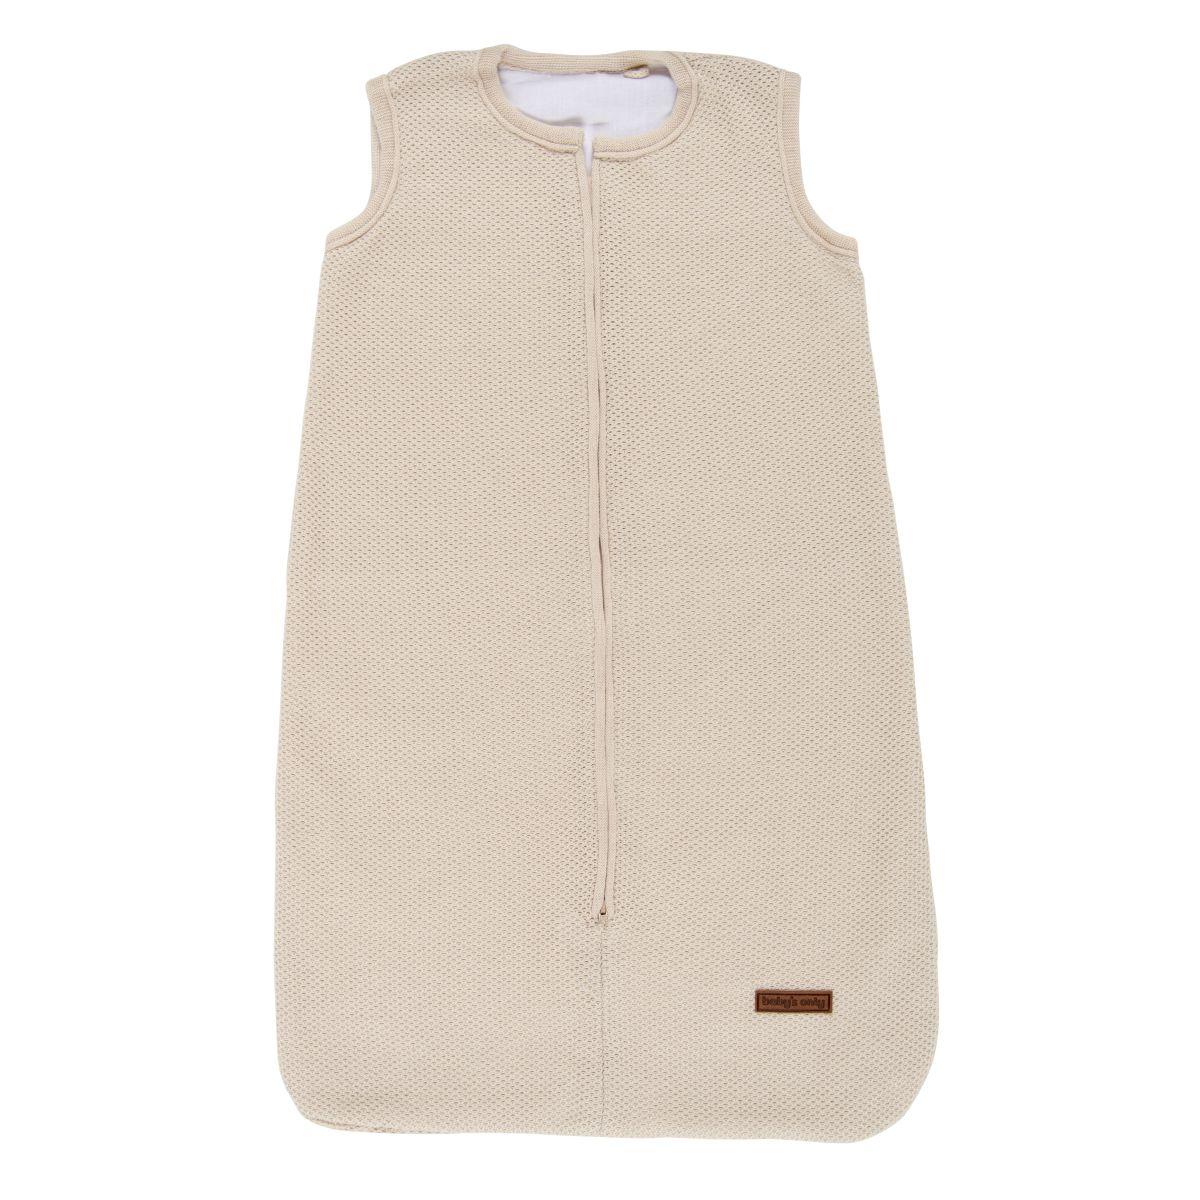 sleeping bag classic sand 70 cm